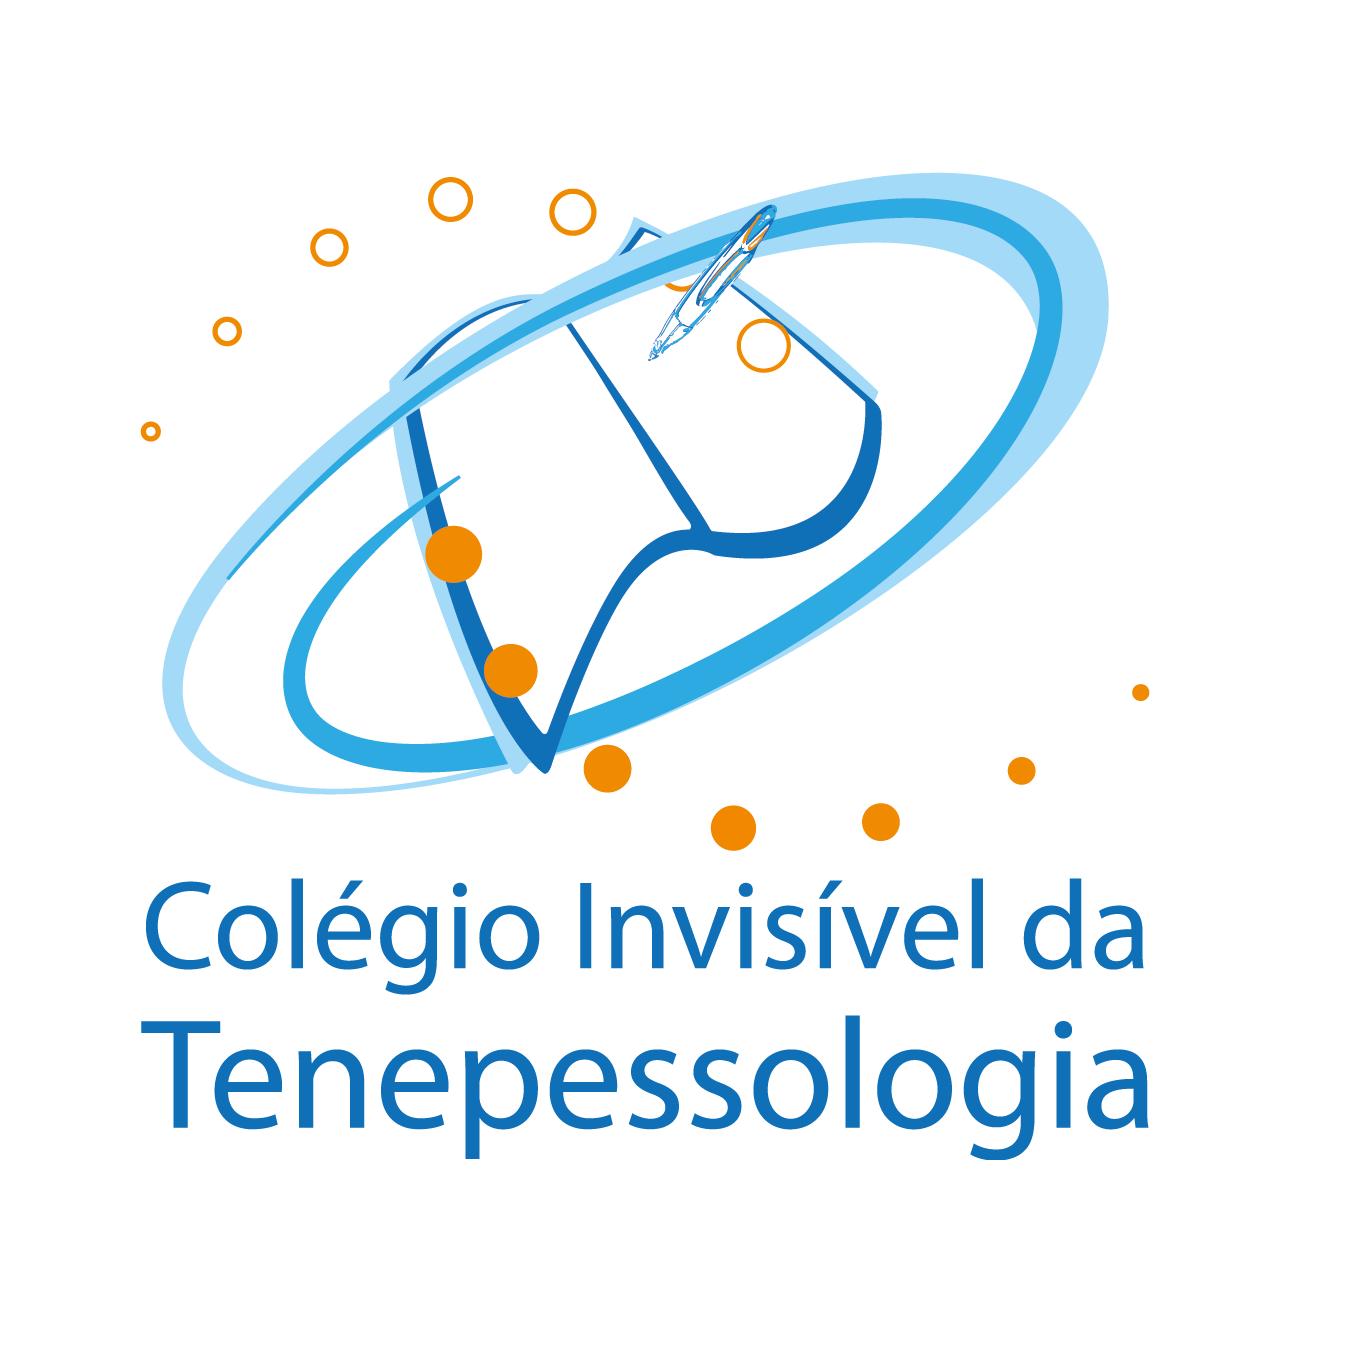 @colegioinvisiveltenepessologia Profile Image | Linktree